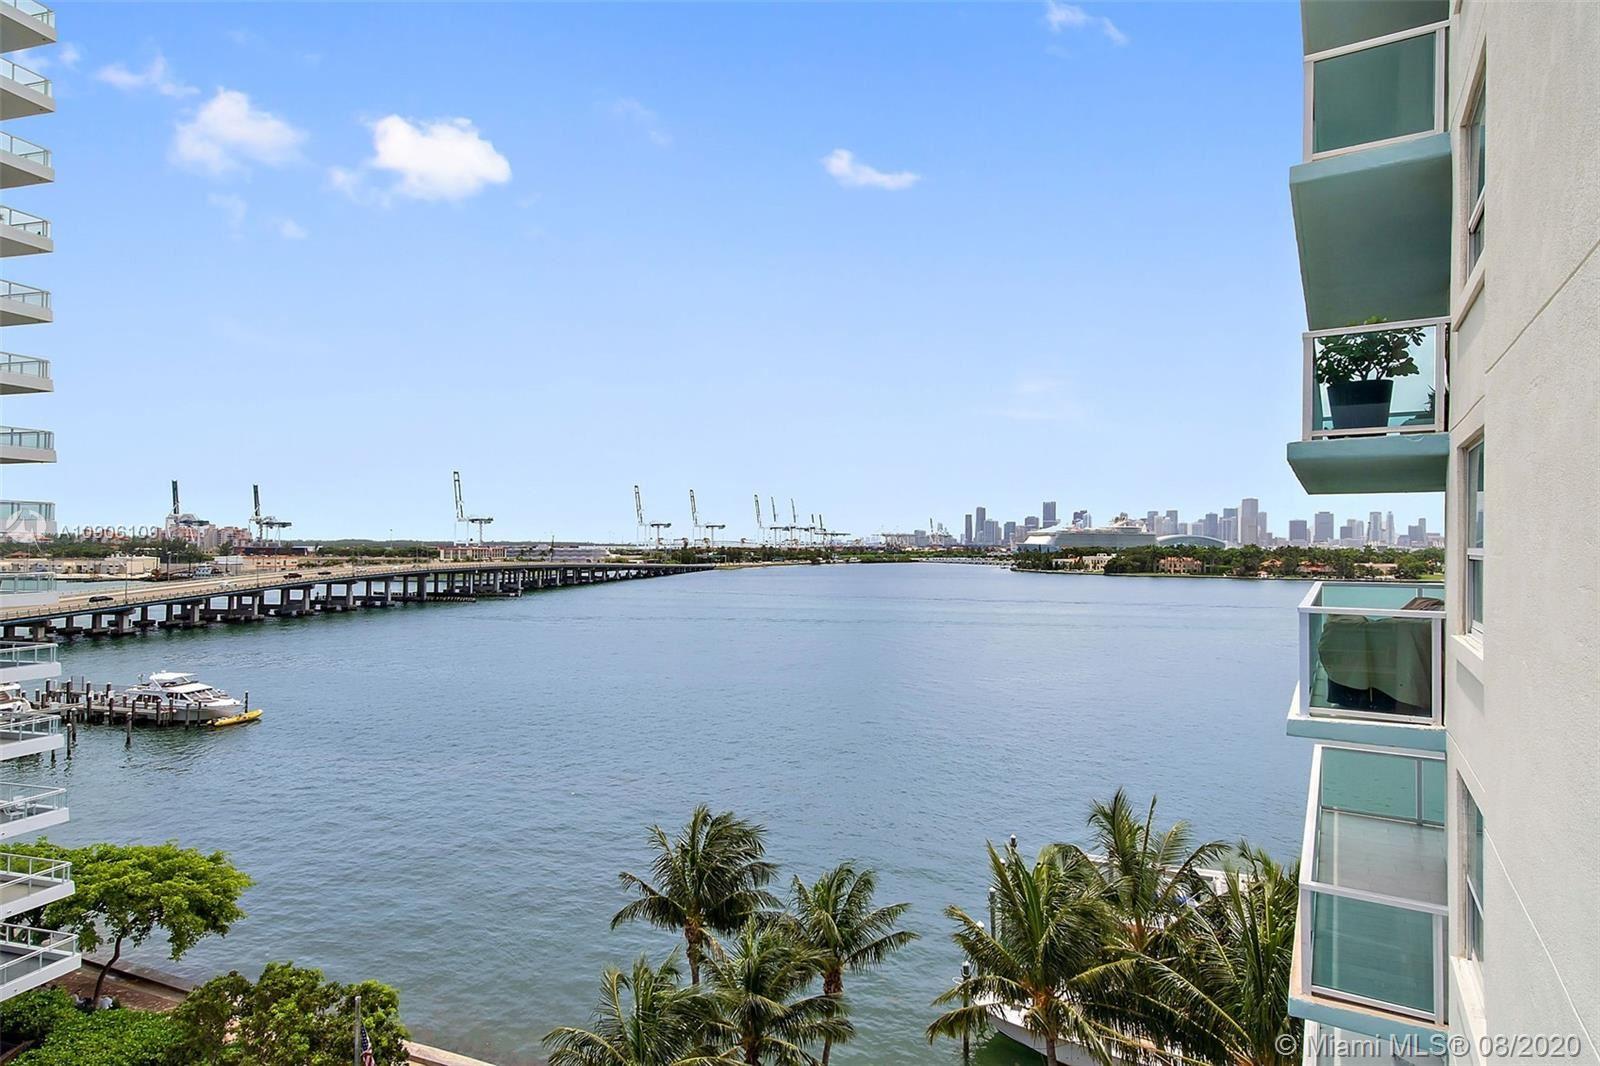 650 West Ave #802, Miami Beach, FL 33139 - #: A10906109